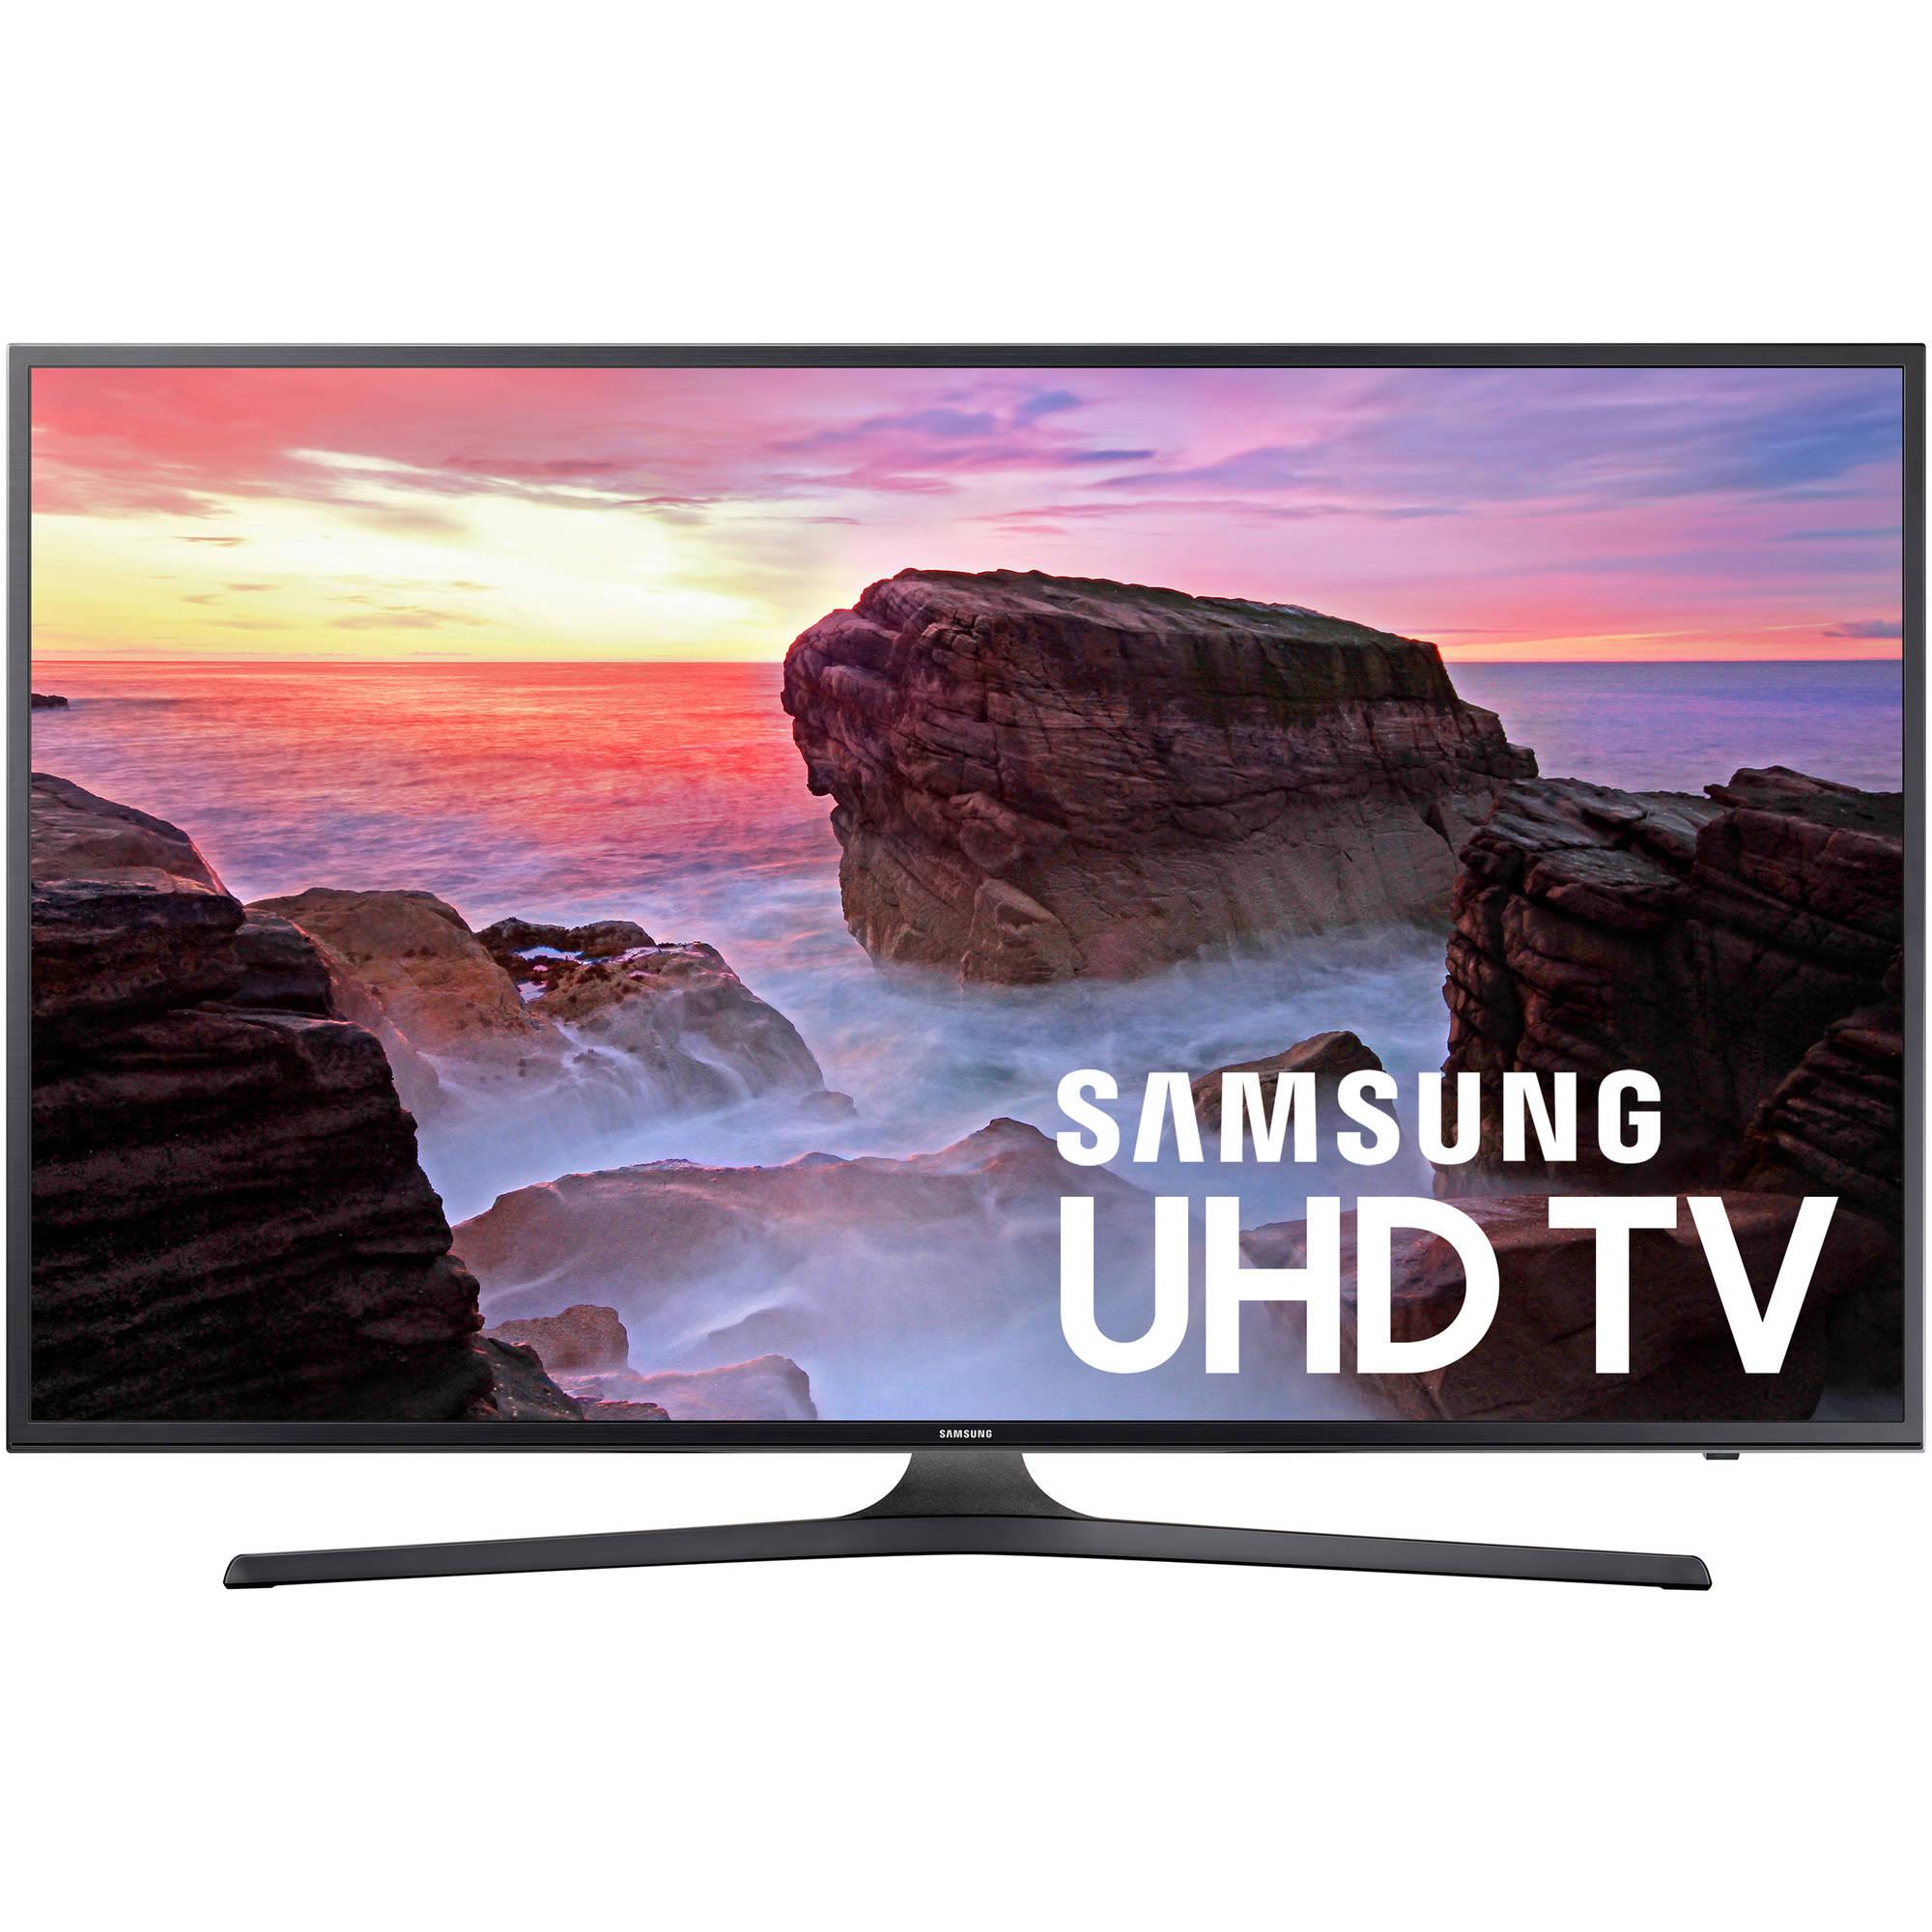 "SAMSUNG 50"" Class 4K (2160P) Ultra HD Smart LED TV (UN50MU6300FXZA) for as low as $299"